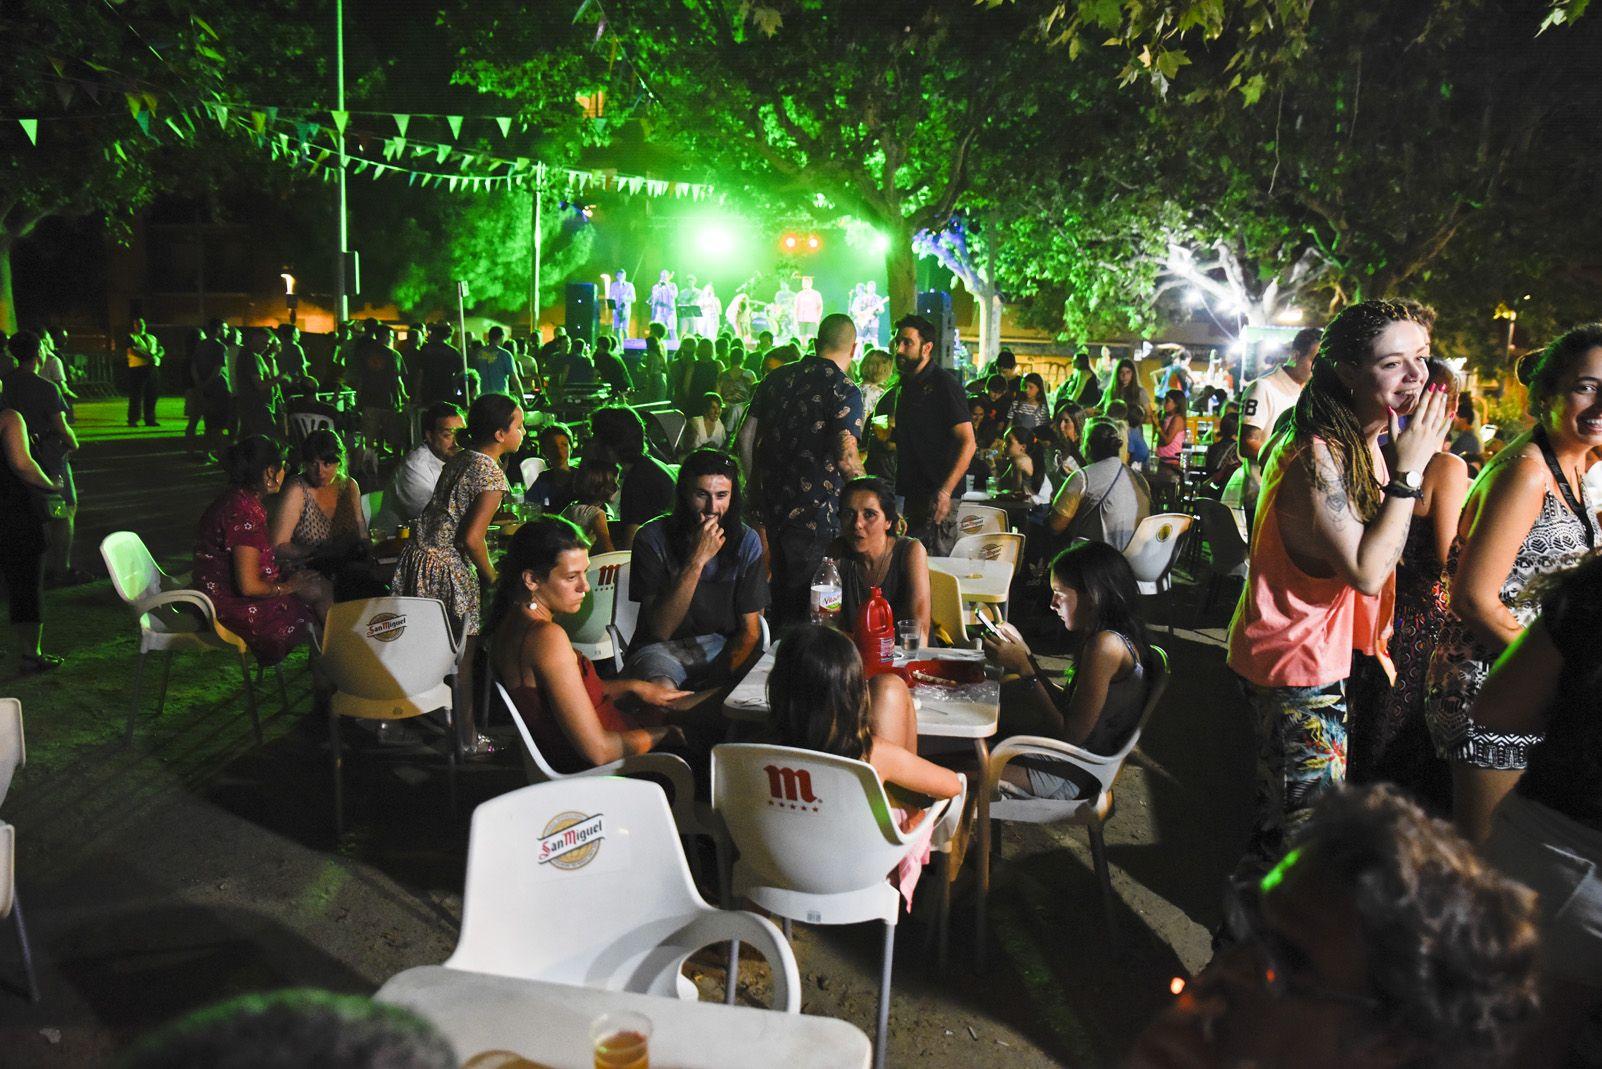 Graellades de Festa Major. Foto: Bernat Millet.